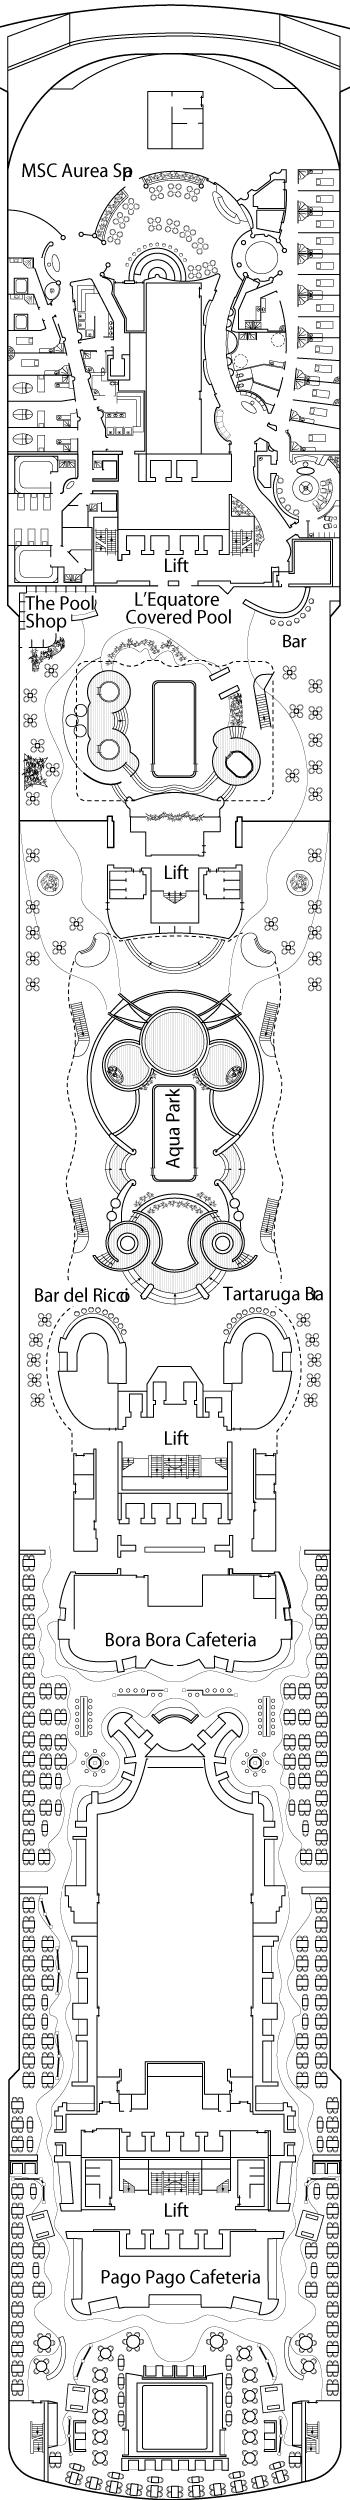 MSC Splendida - Raffaello